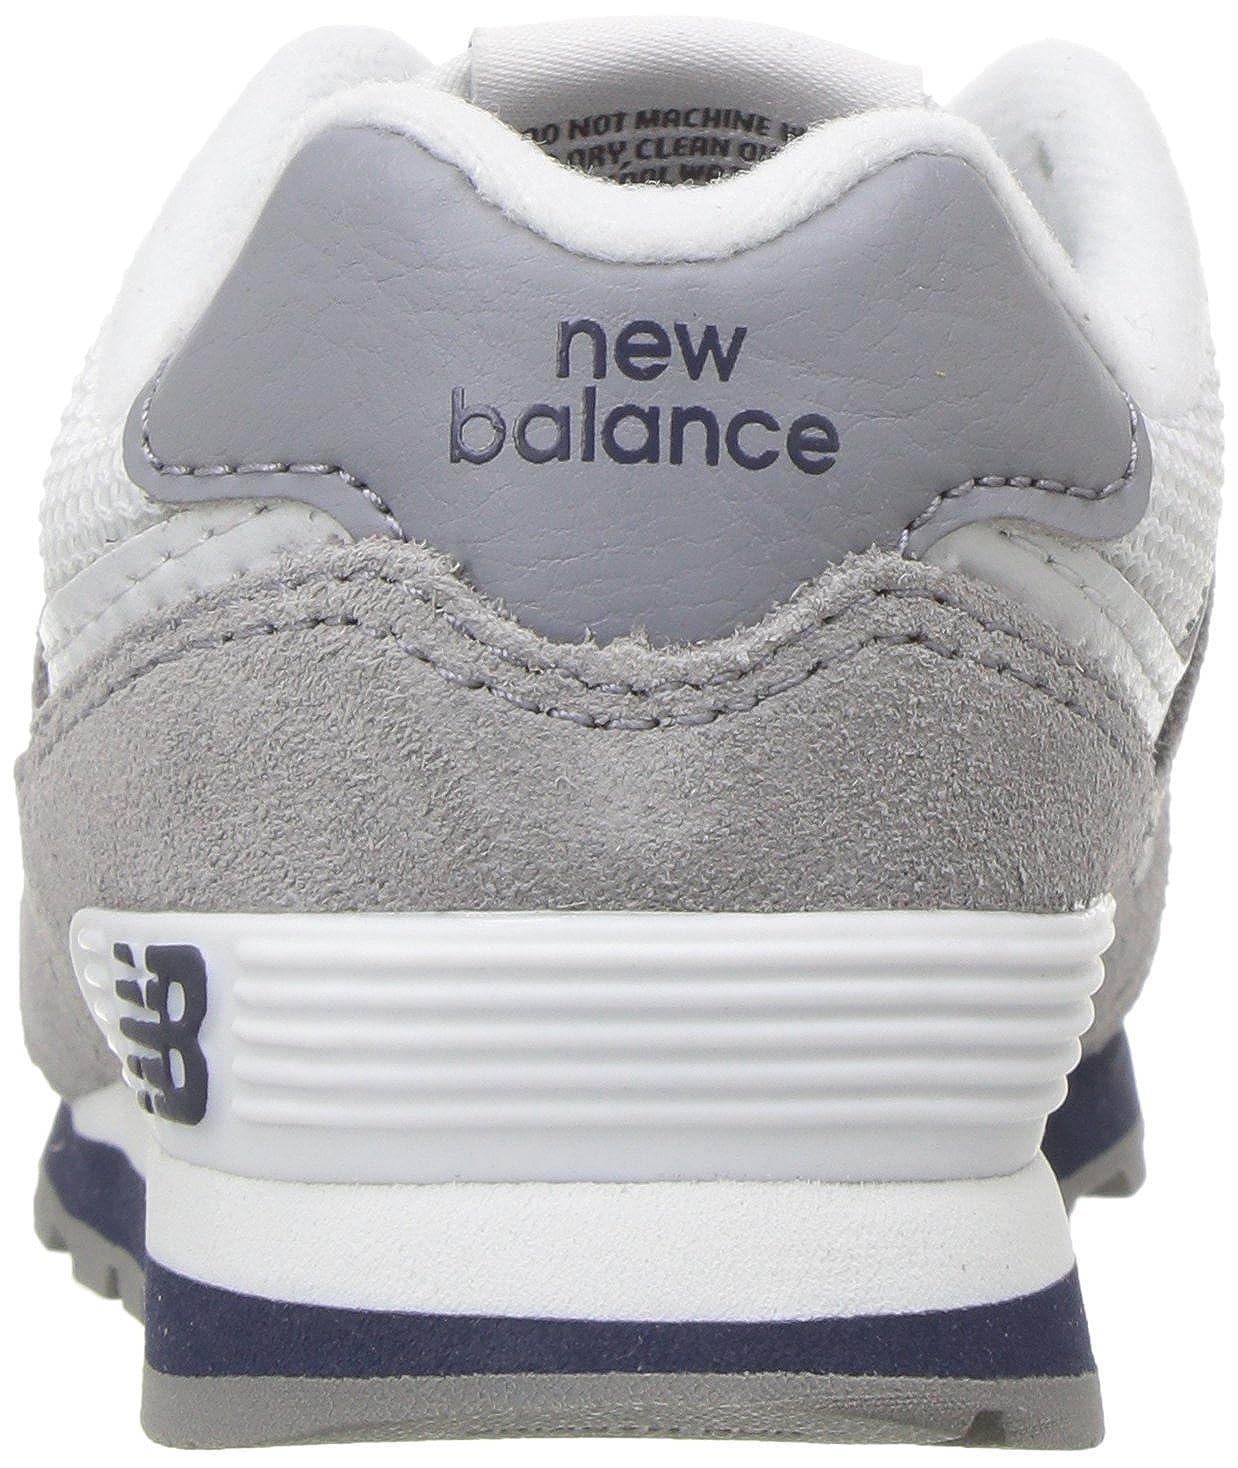 New Balance Unisex Baby 574 IC574 Schuhe: